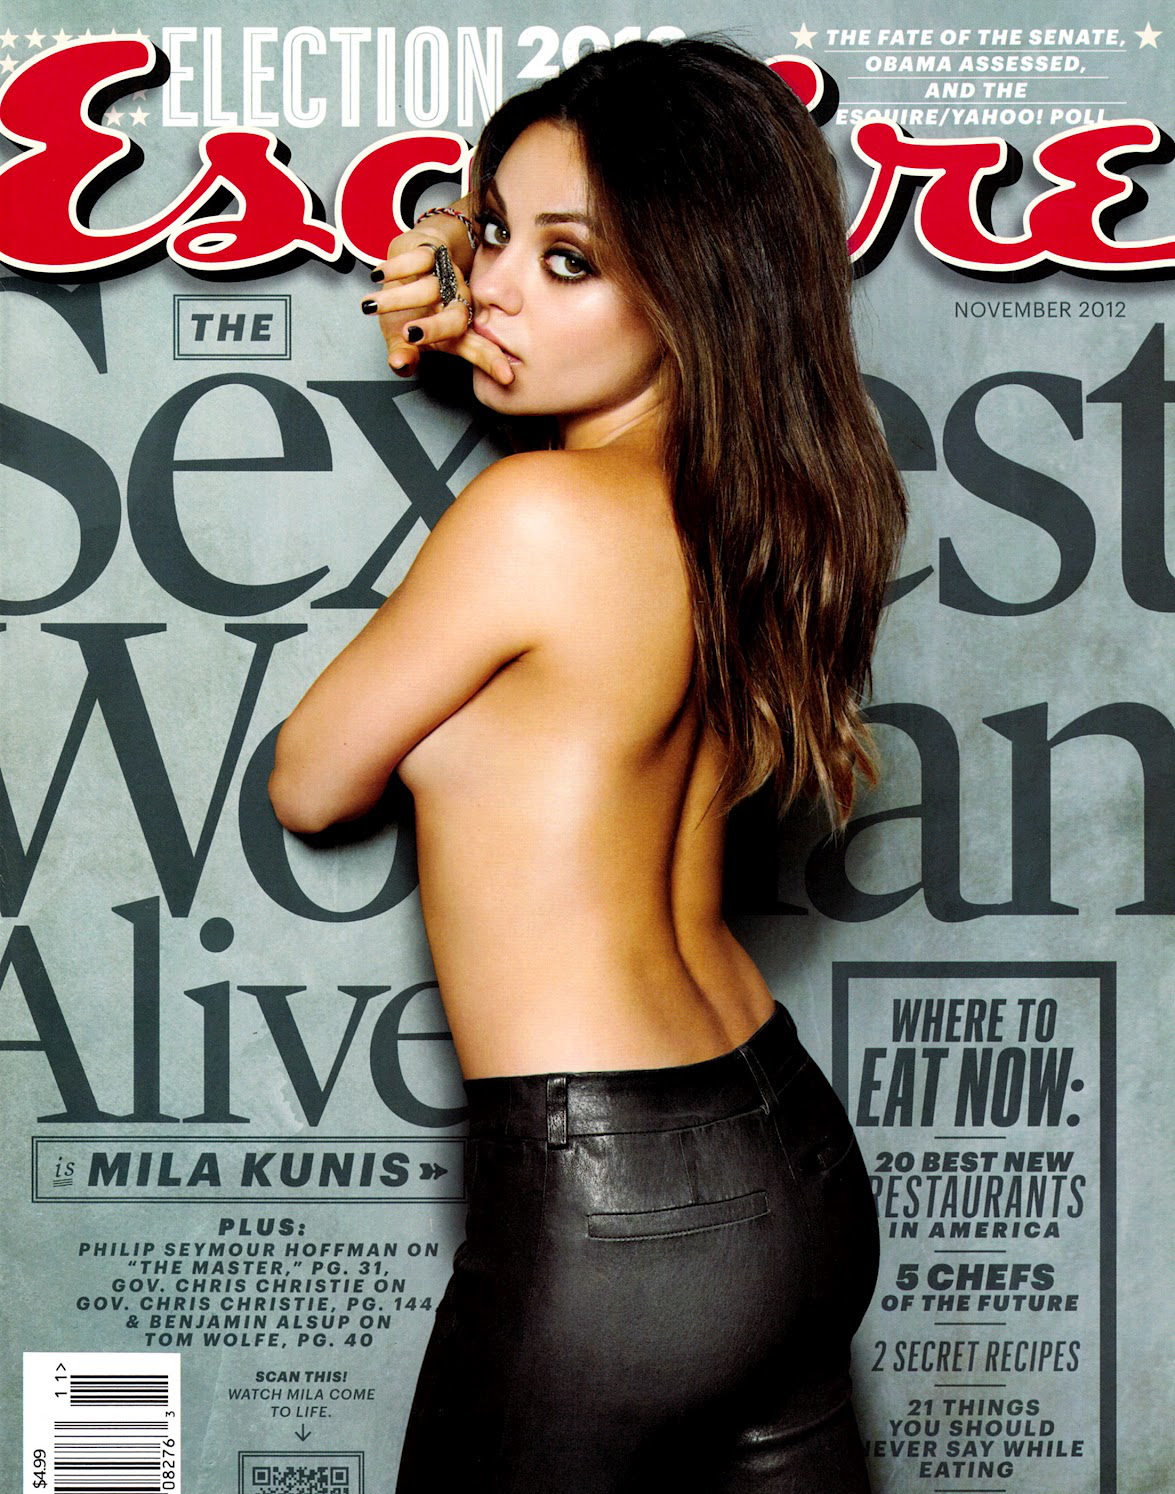 Mila-Kunis-Esquire-November-2012-1